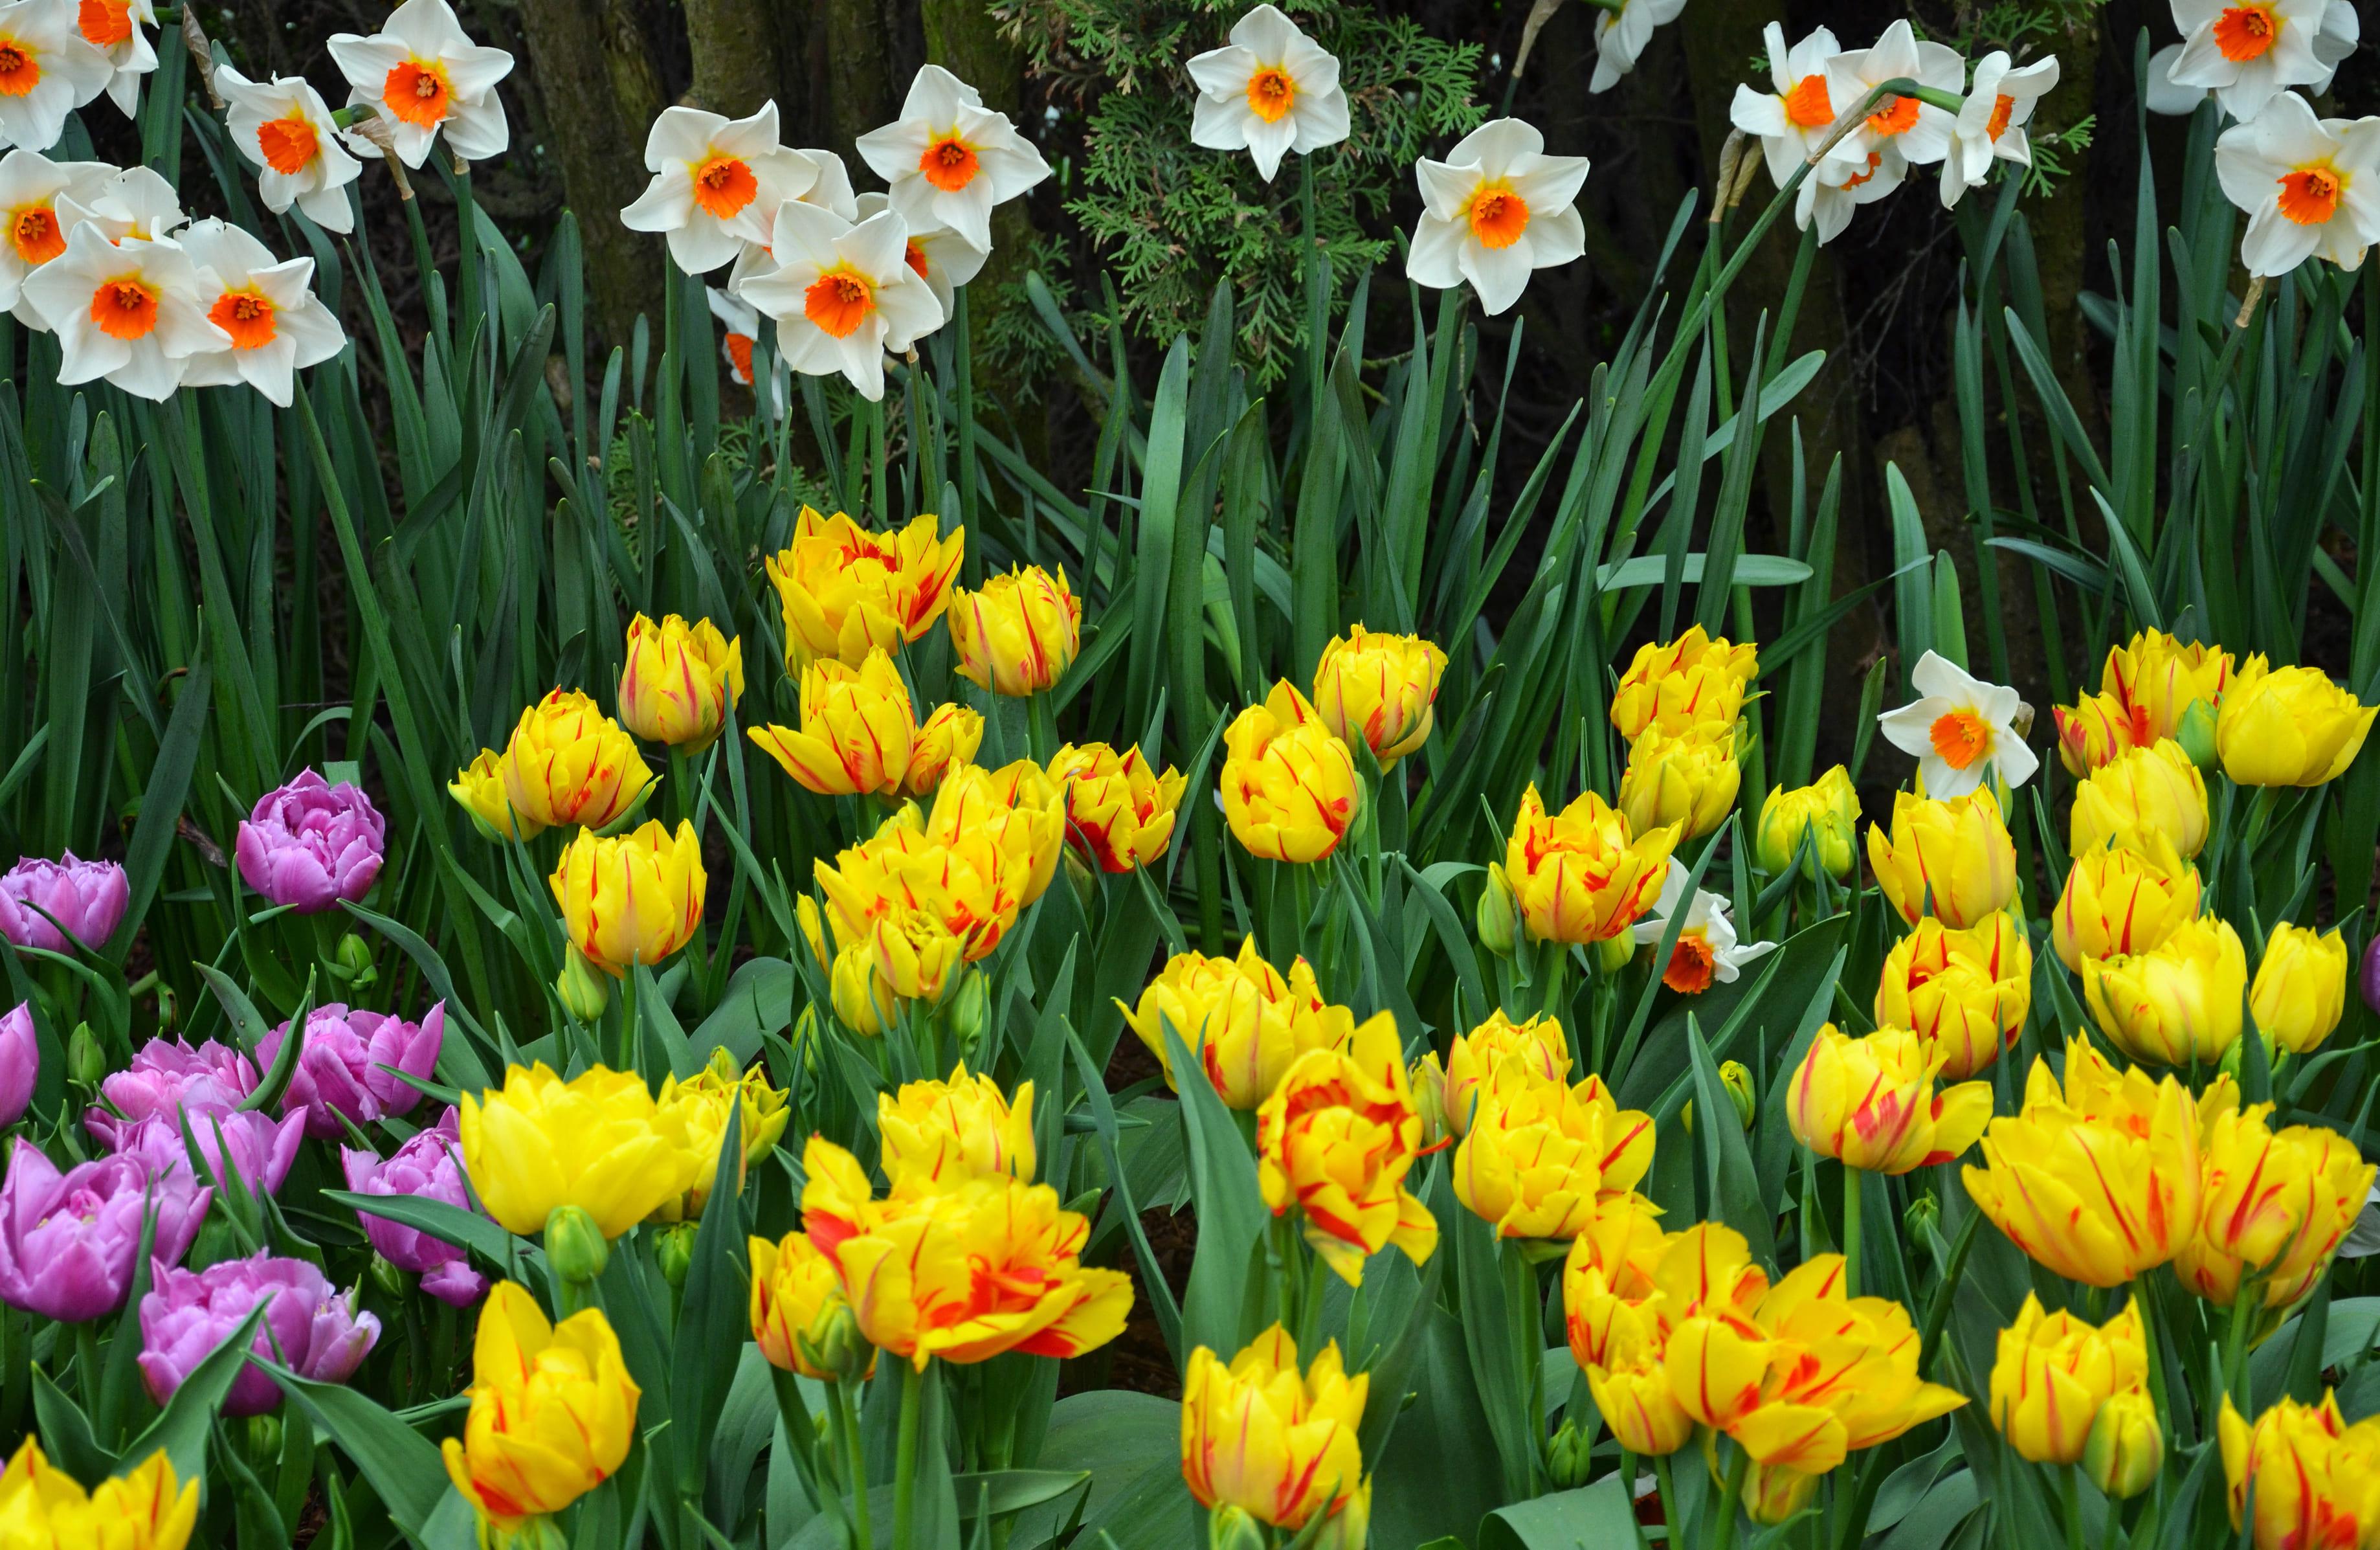 daffodils-photo-69